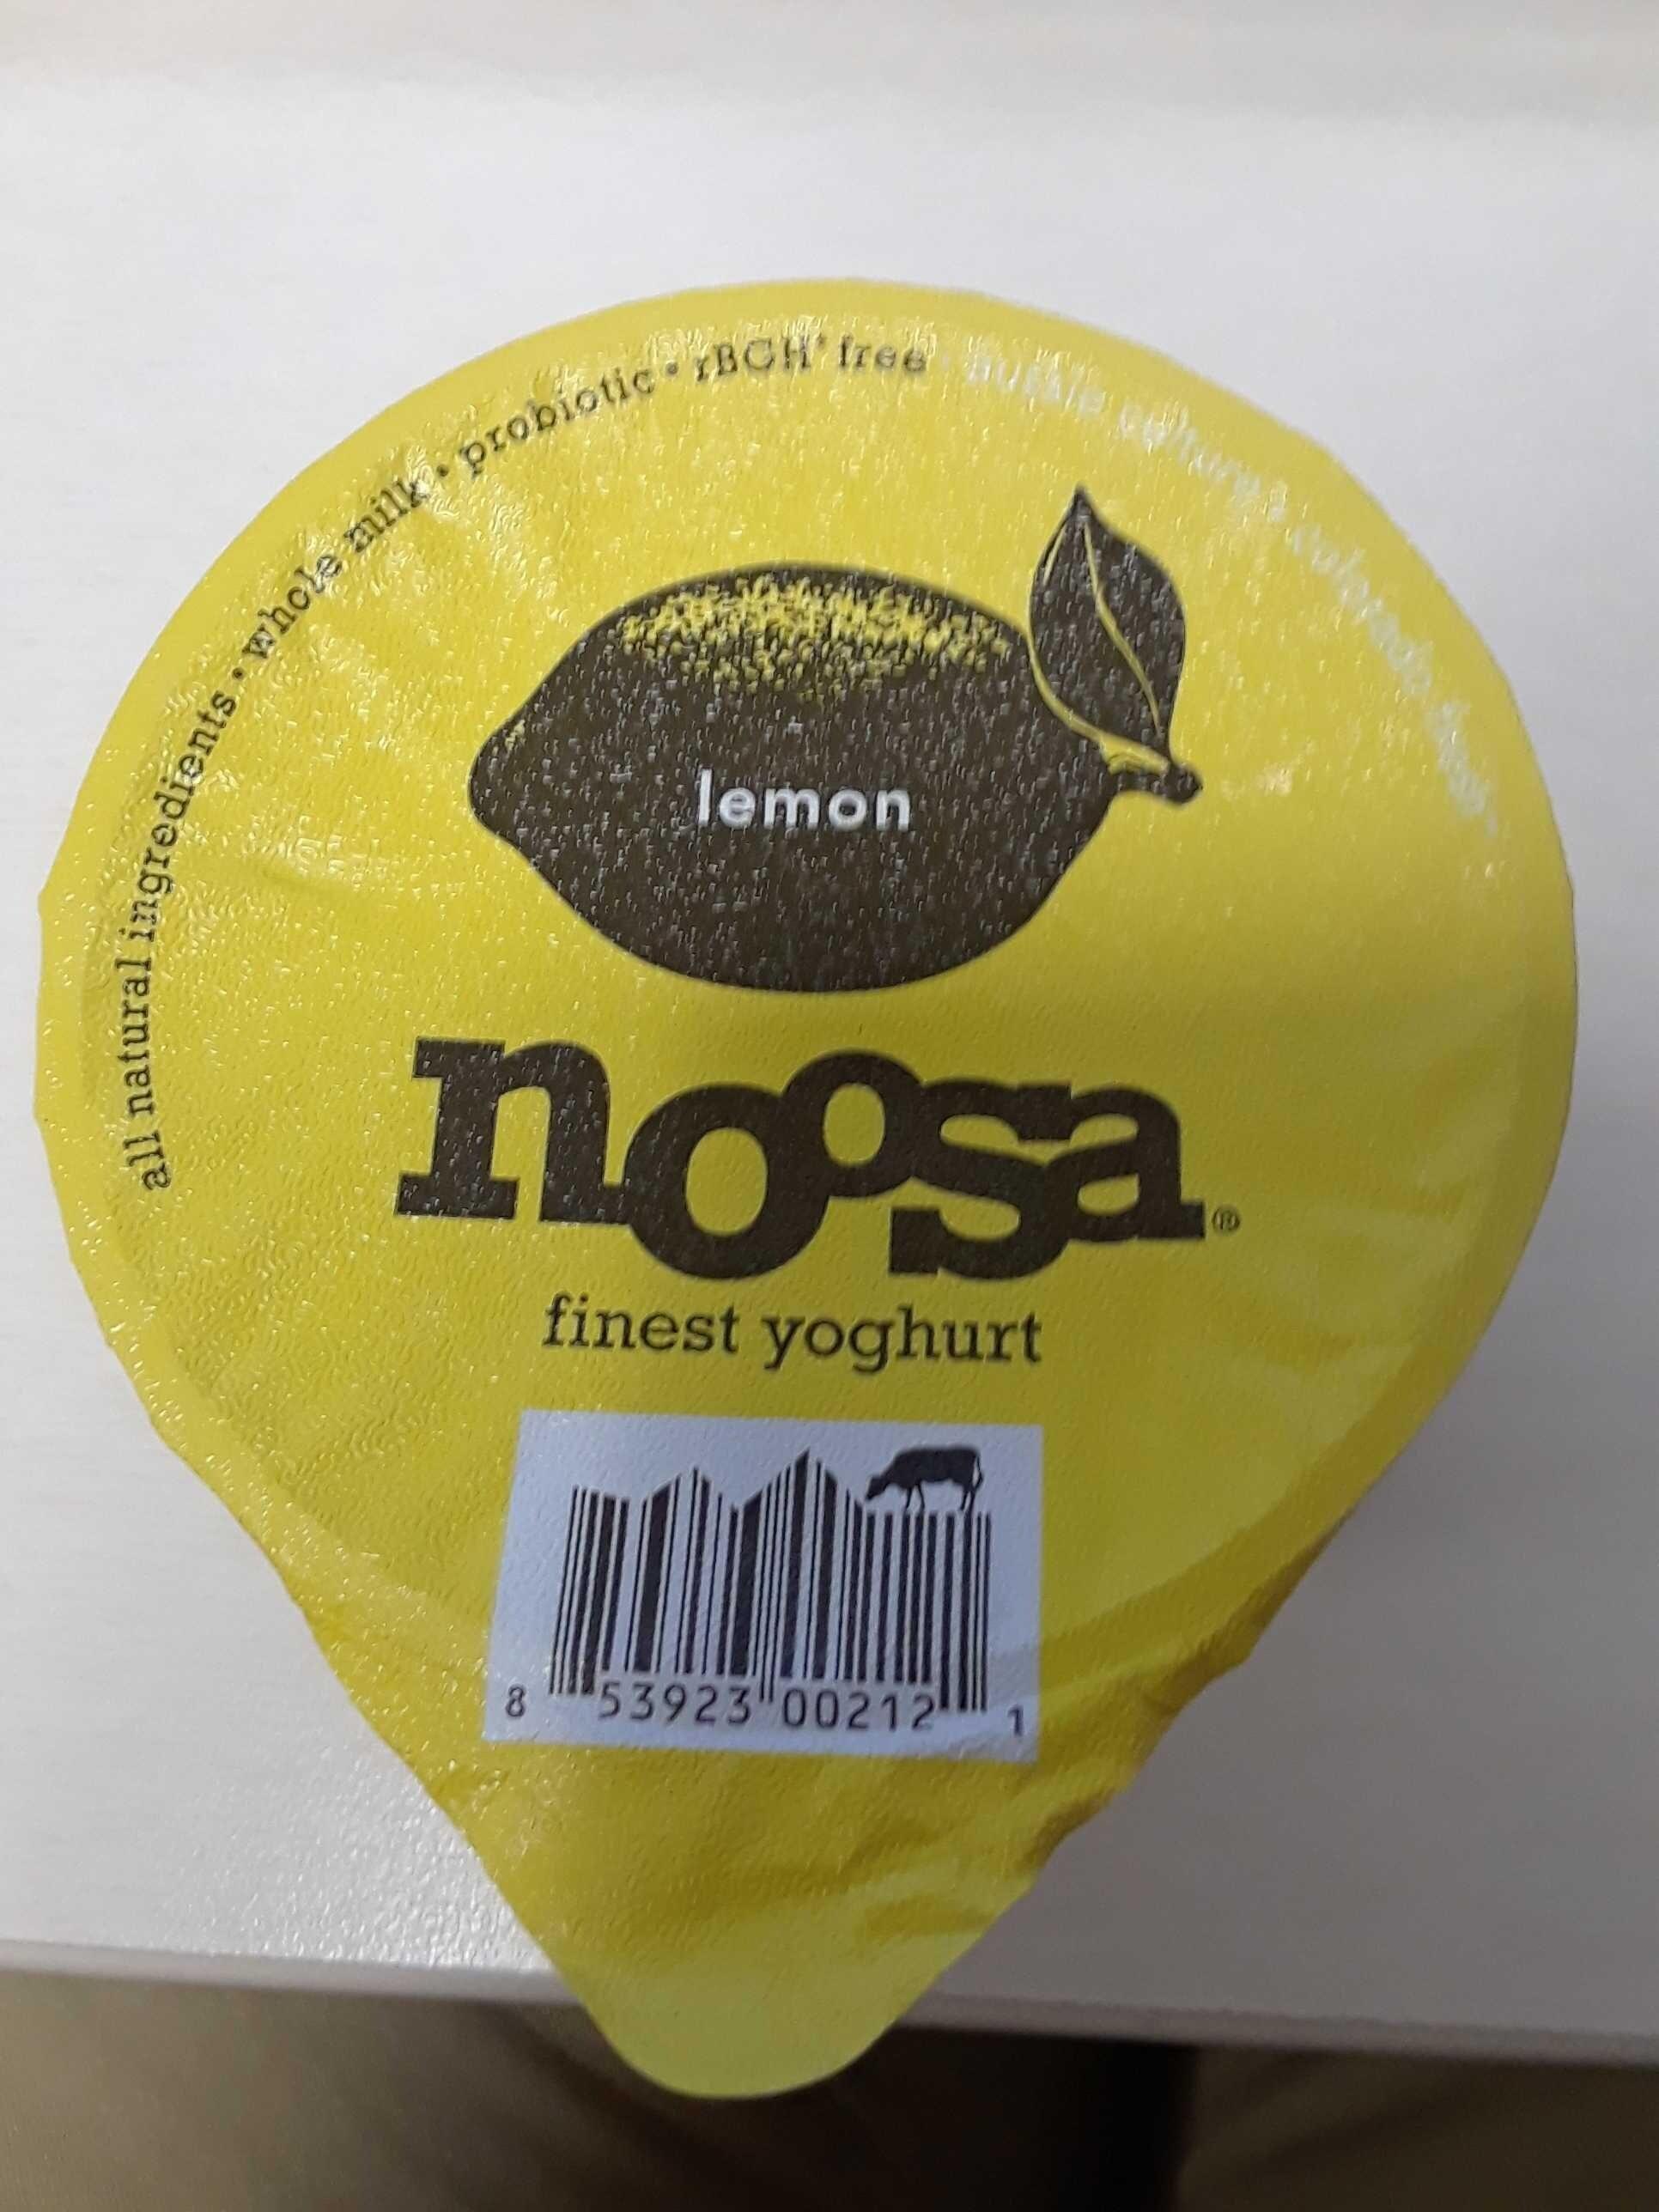 Lemon yoghurt - Product - en